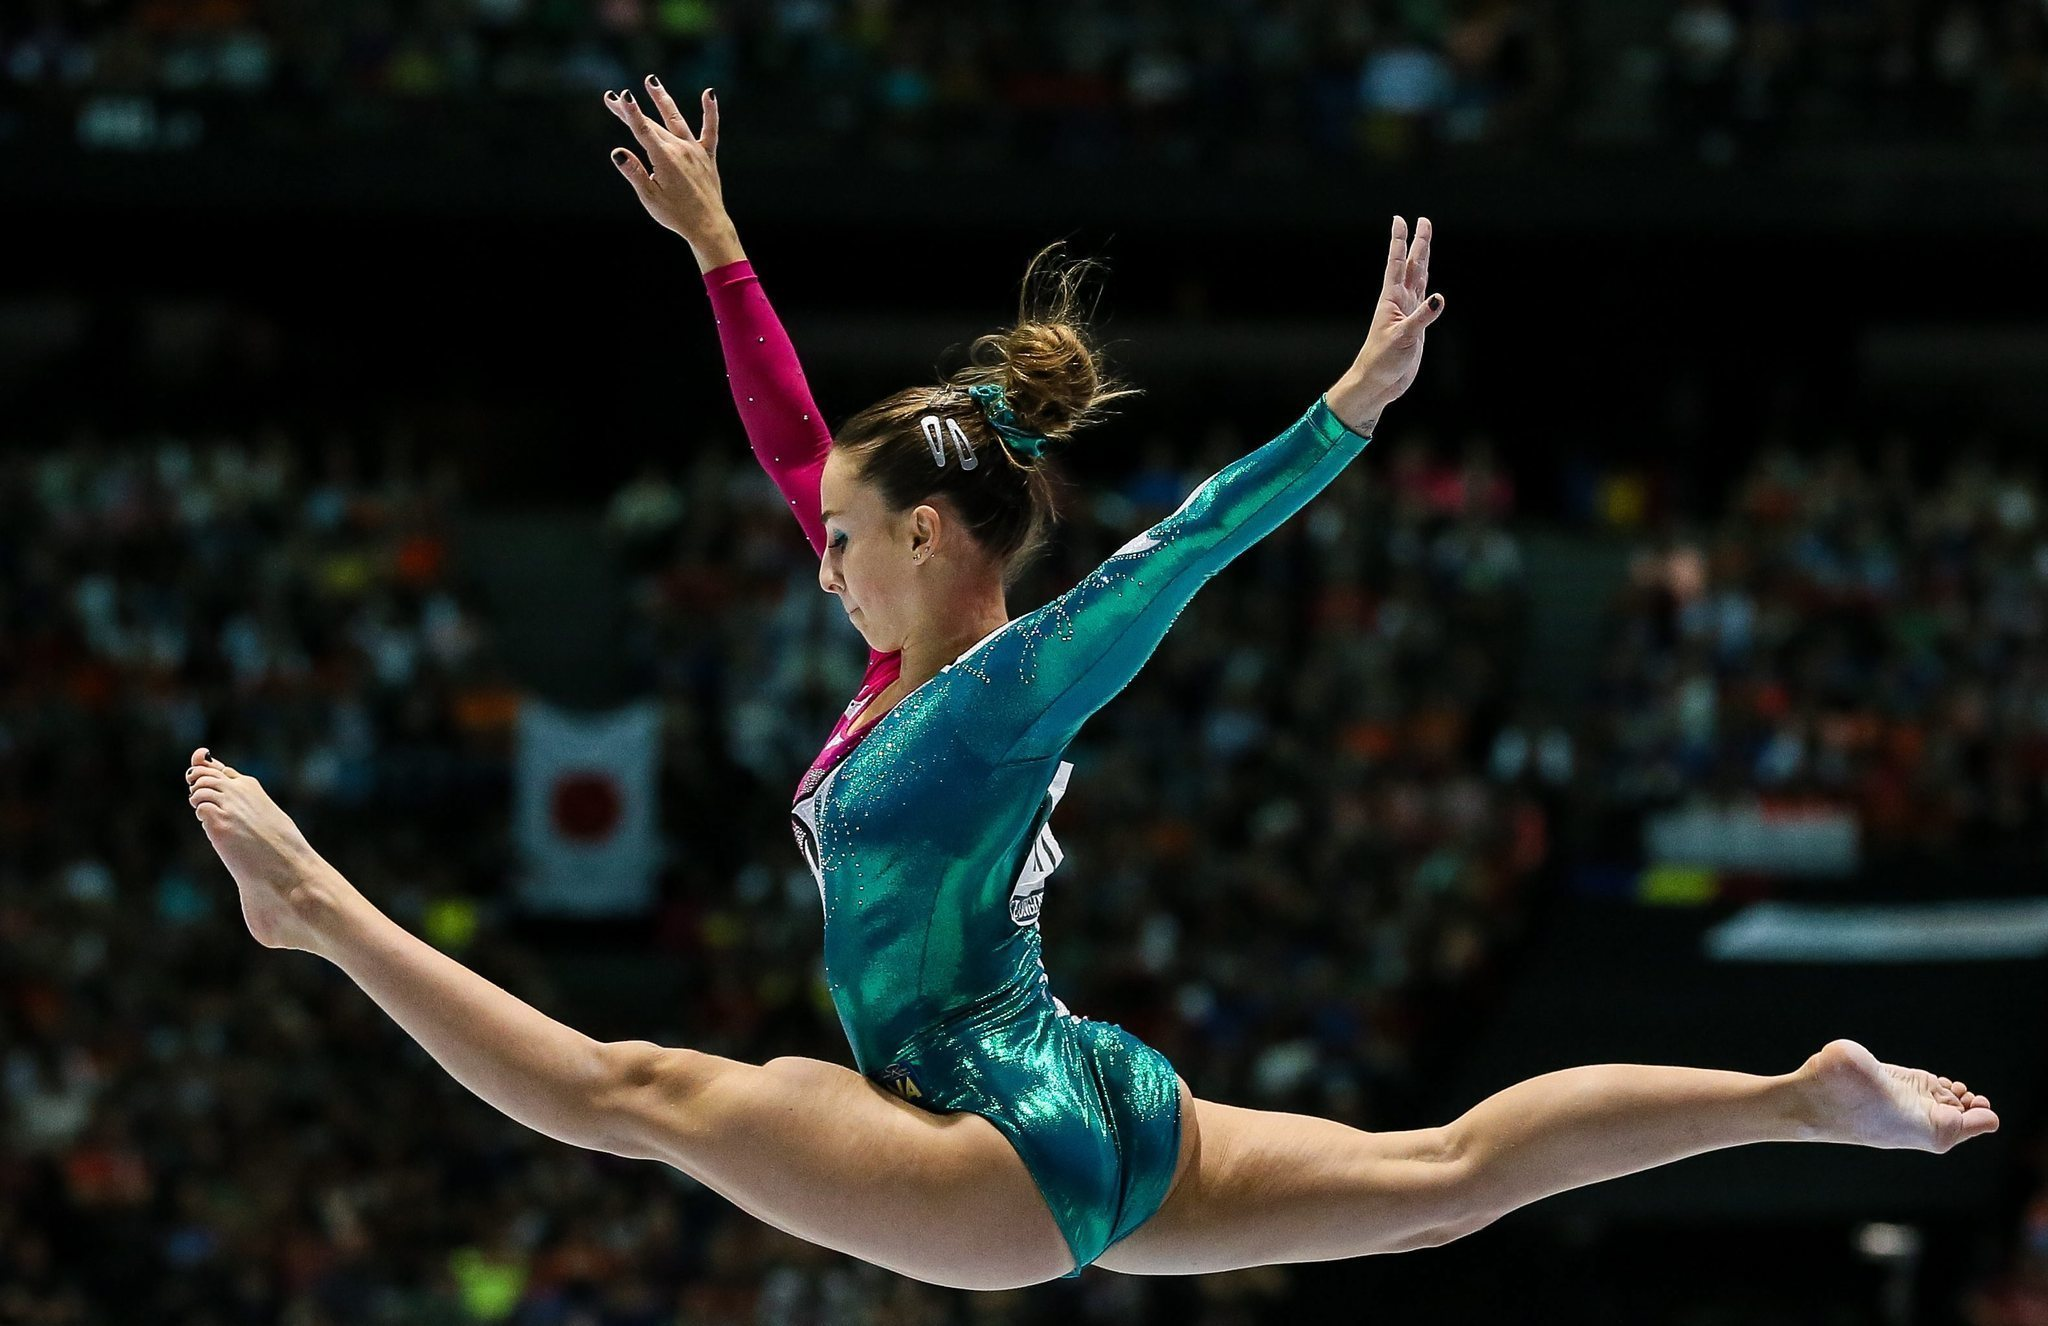 Hot italian gymnast babe — pic 2